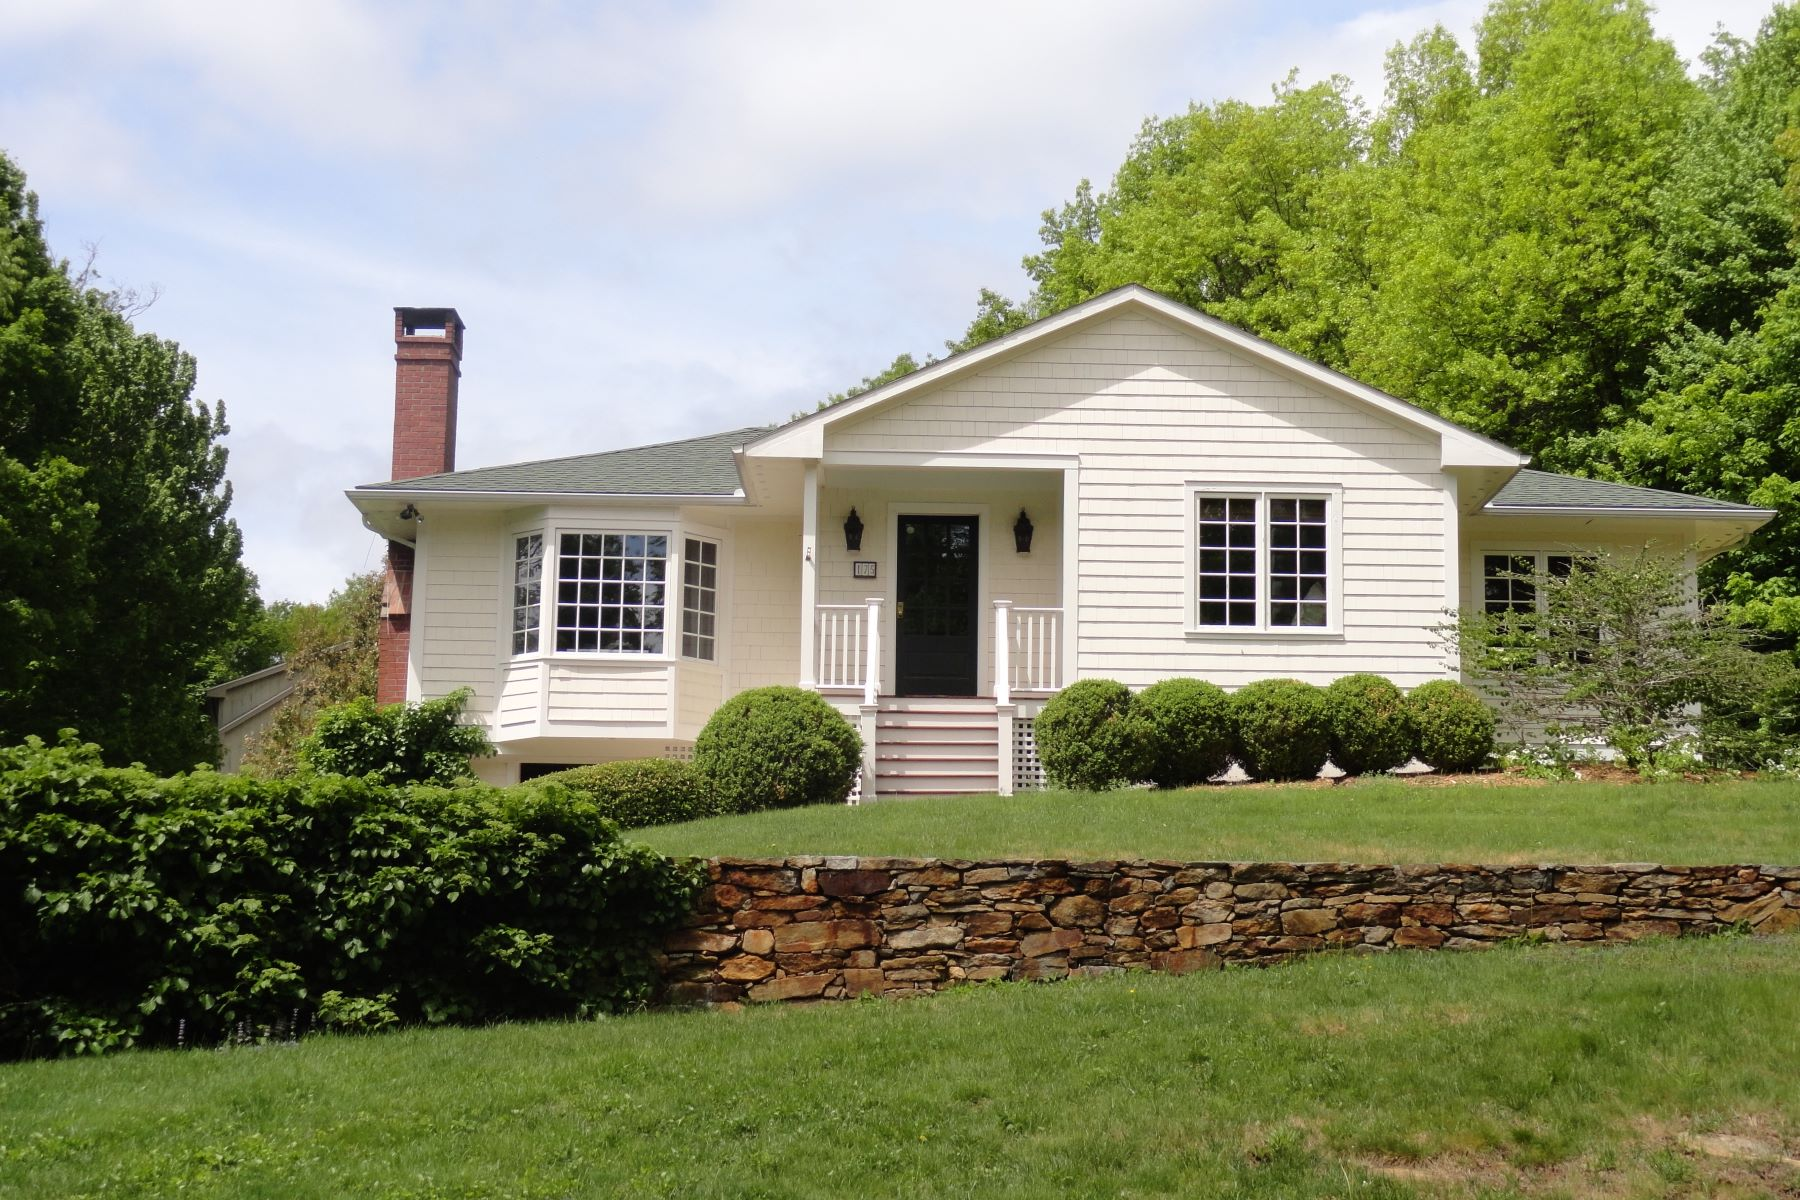 Single Family Homes для того Продажа на Distant views that overlook conservation lands 175 East Street, Sharon, Коннектикут 06069 Соединенные Штаты